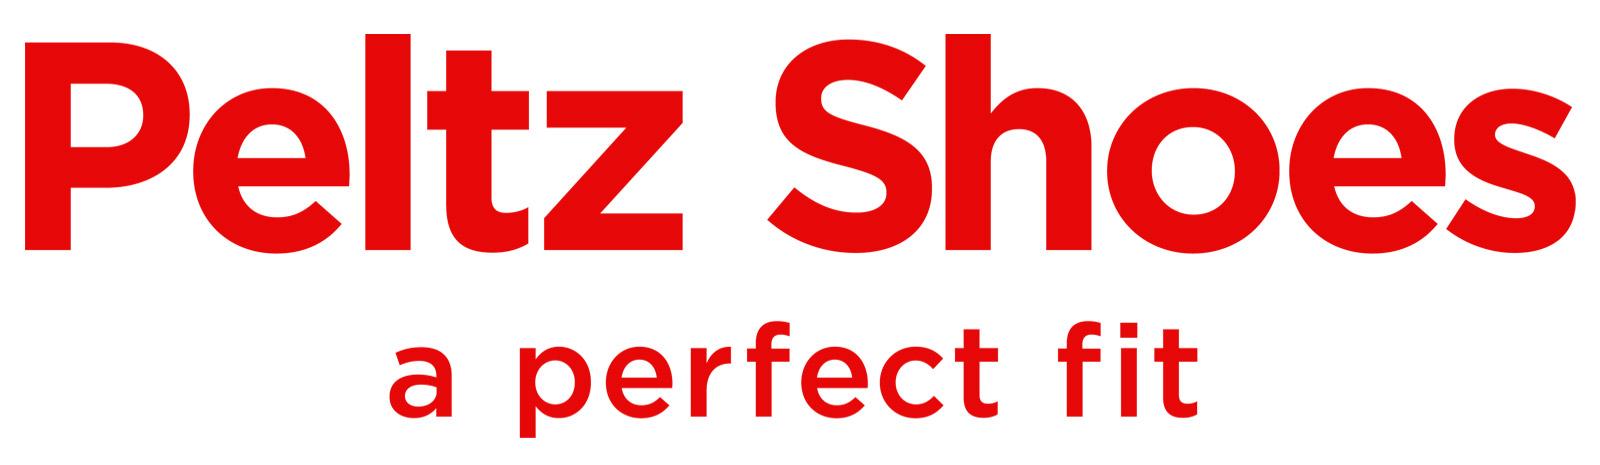 photo regarding Peltz Shoes Printable Coupons known as Peltz shoe coupon - Doorway warmth stopper